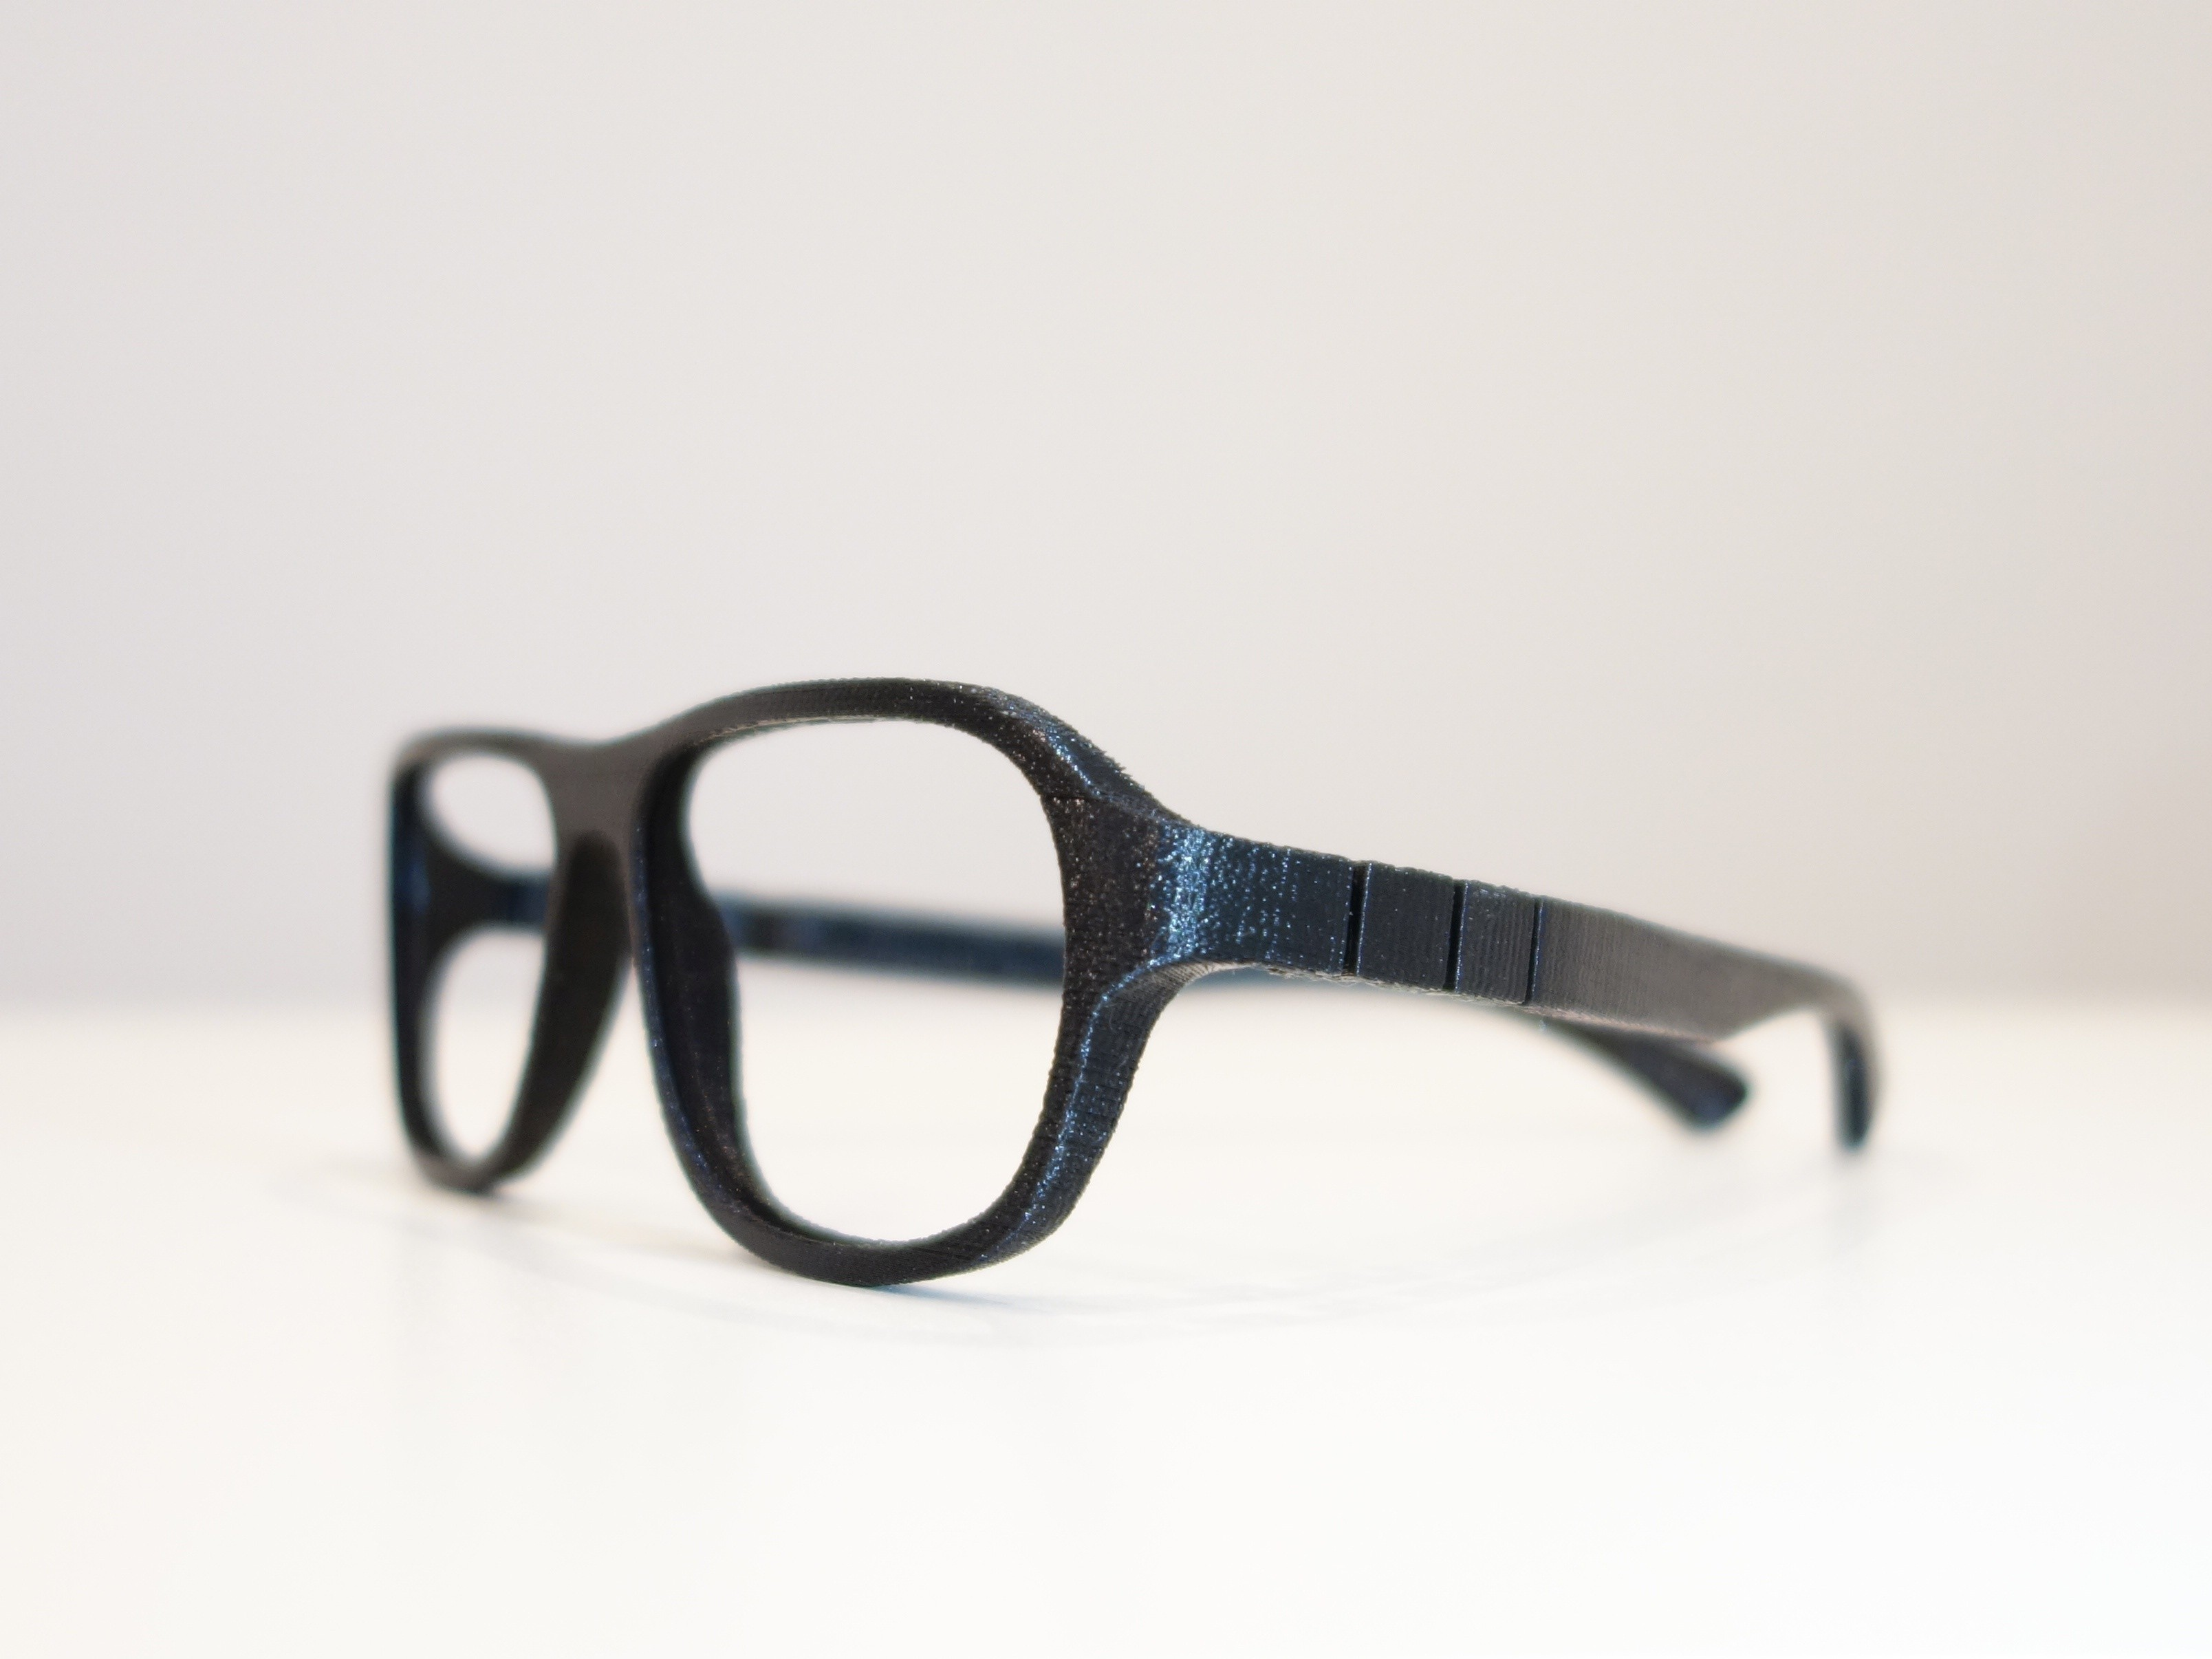 DSC03595.JPG Download free STL file VirtualTryOn.com - 3D Printing Glasses - Steve v2 - VTO • Object to 3D print, Sacha_Zacaropoulos